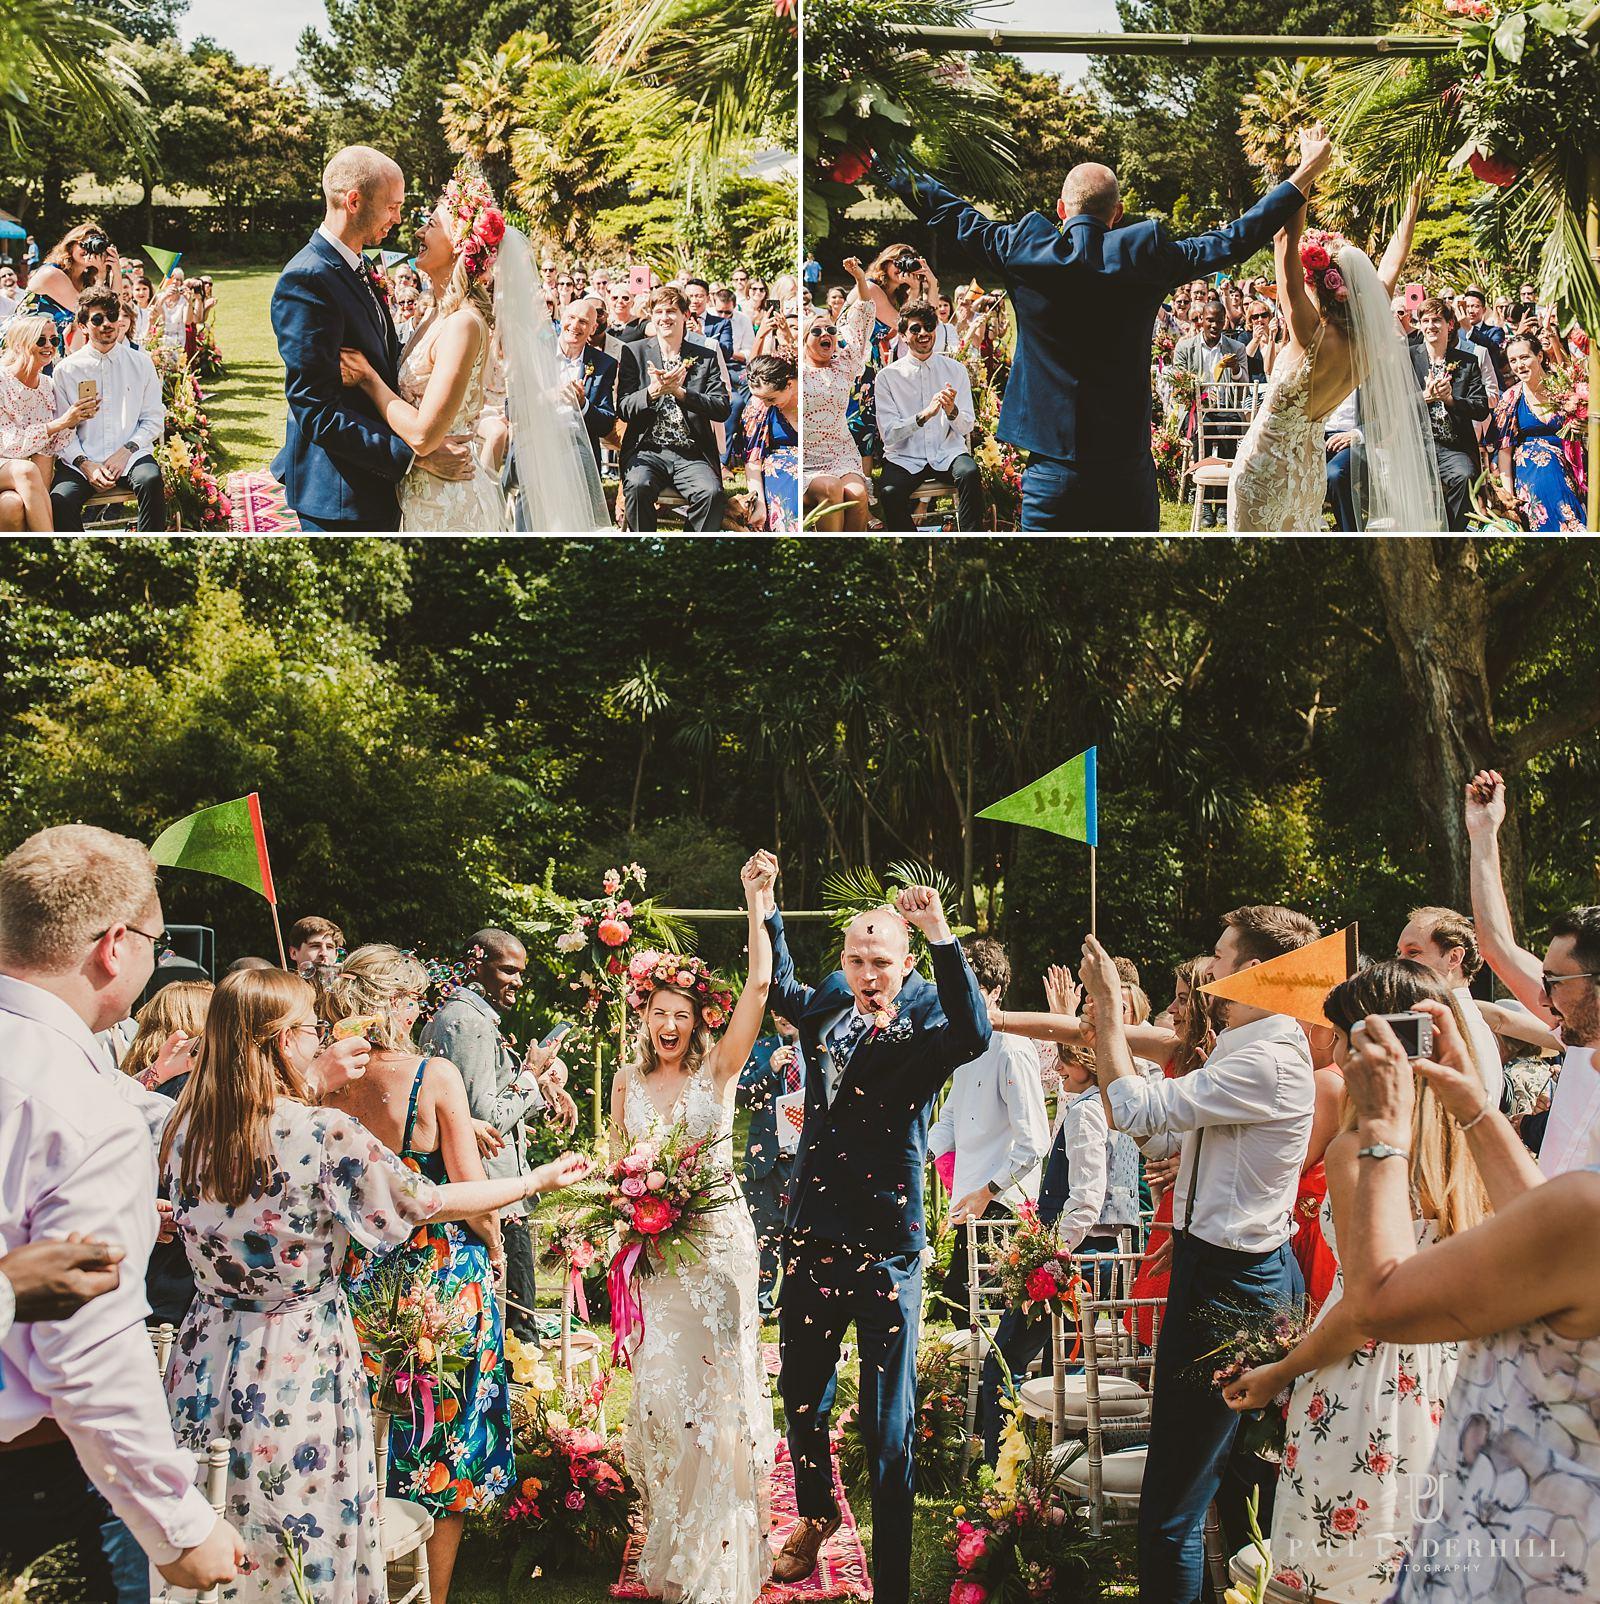 Abbotsbury Subtropical Gardens wedding photography in Dorset